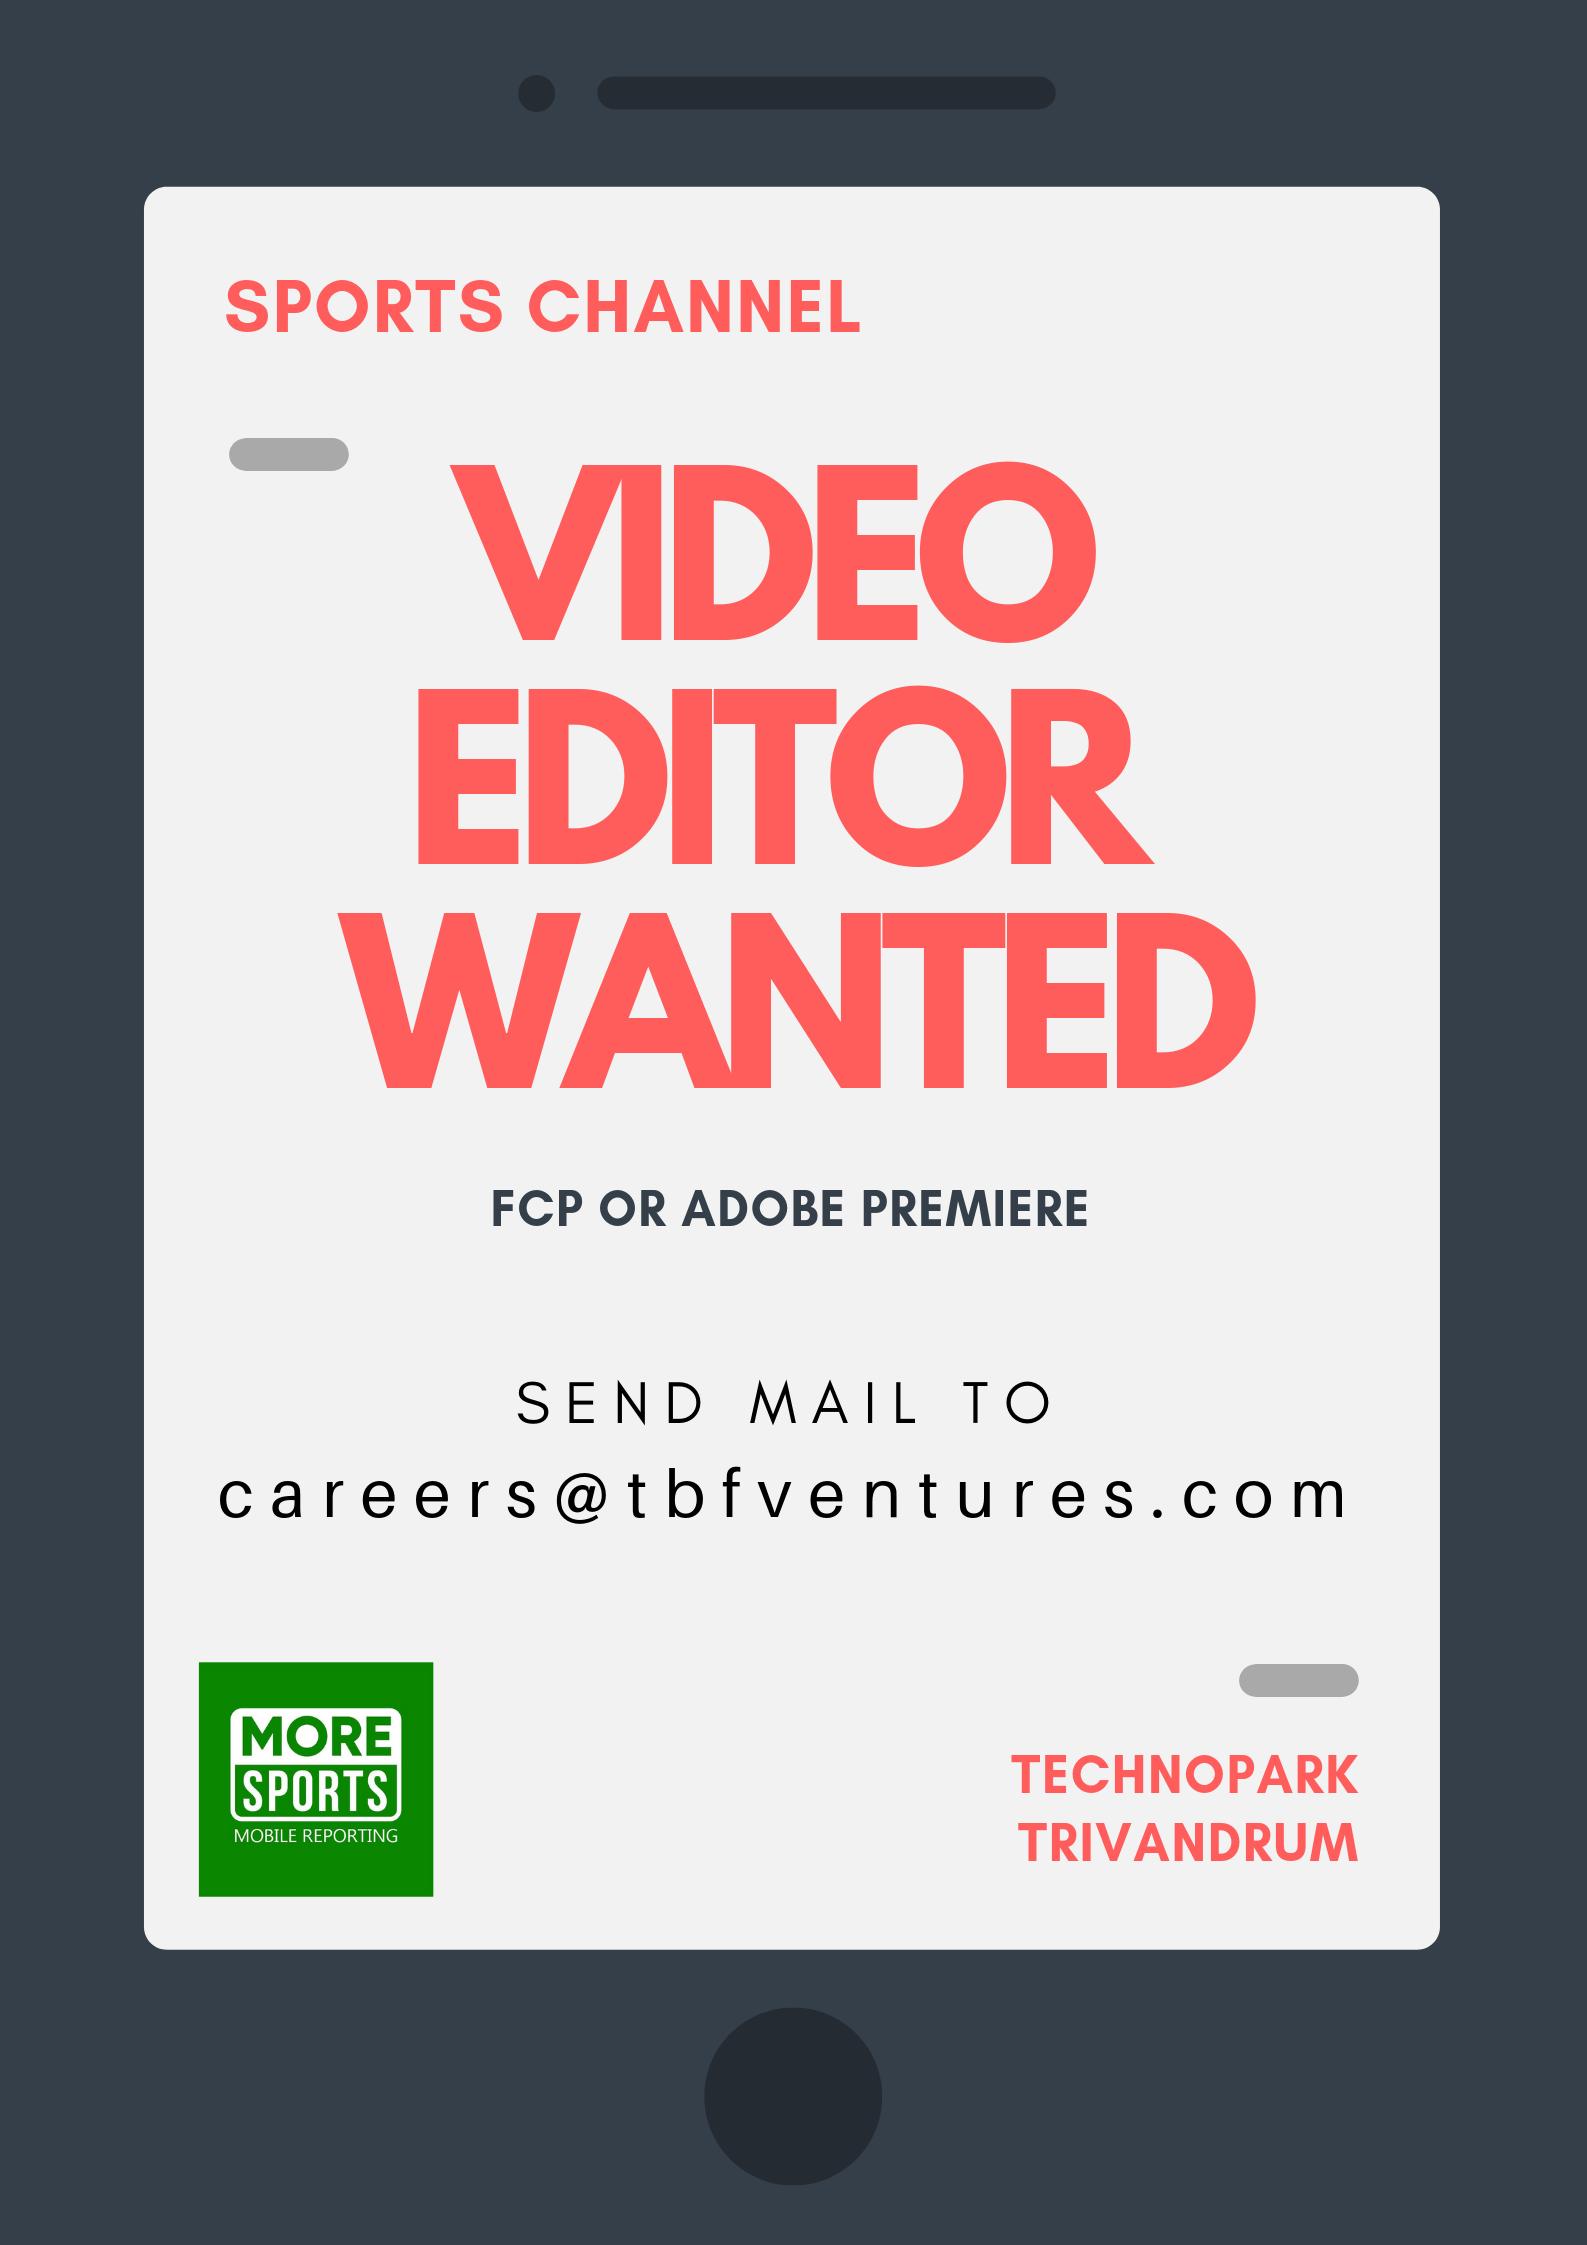 Video Editor Jobs in Trivandrum , Technopark Video